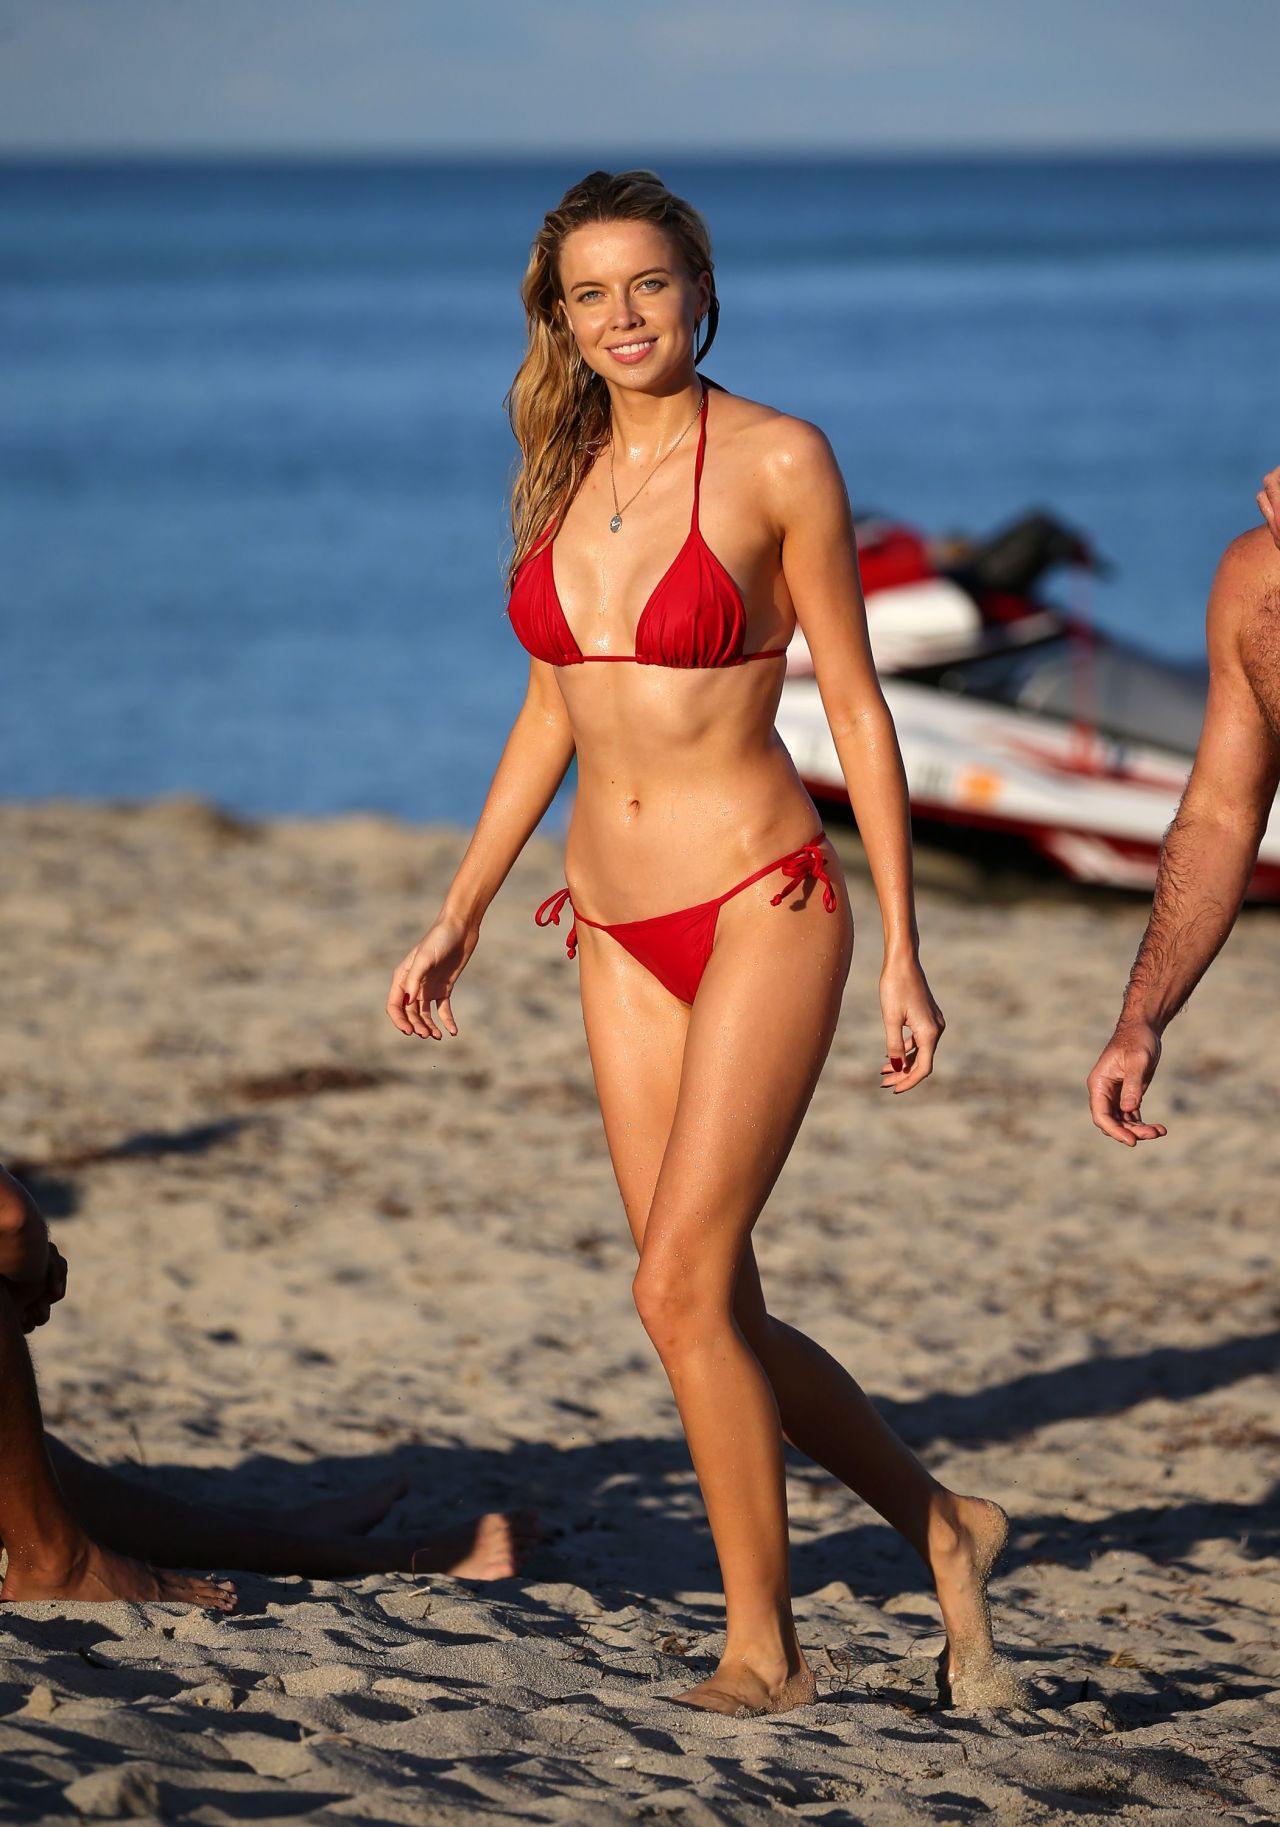 Bikini Samantha Jade naked (19 photos), Tits, Paparazzi, Selfie, in bikini 2018